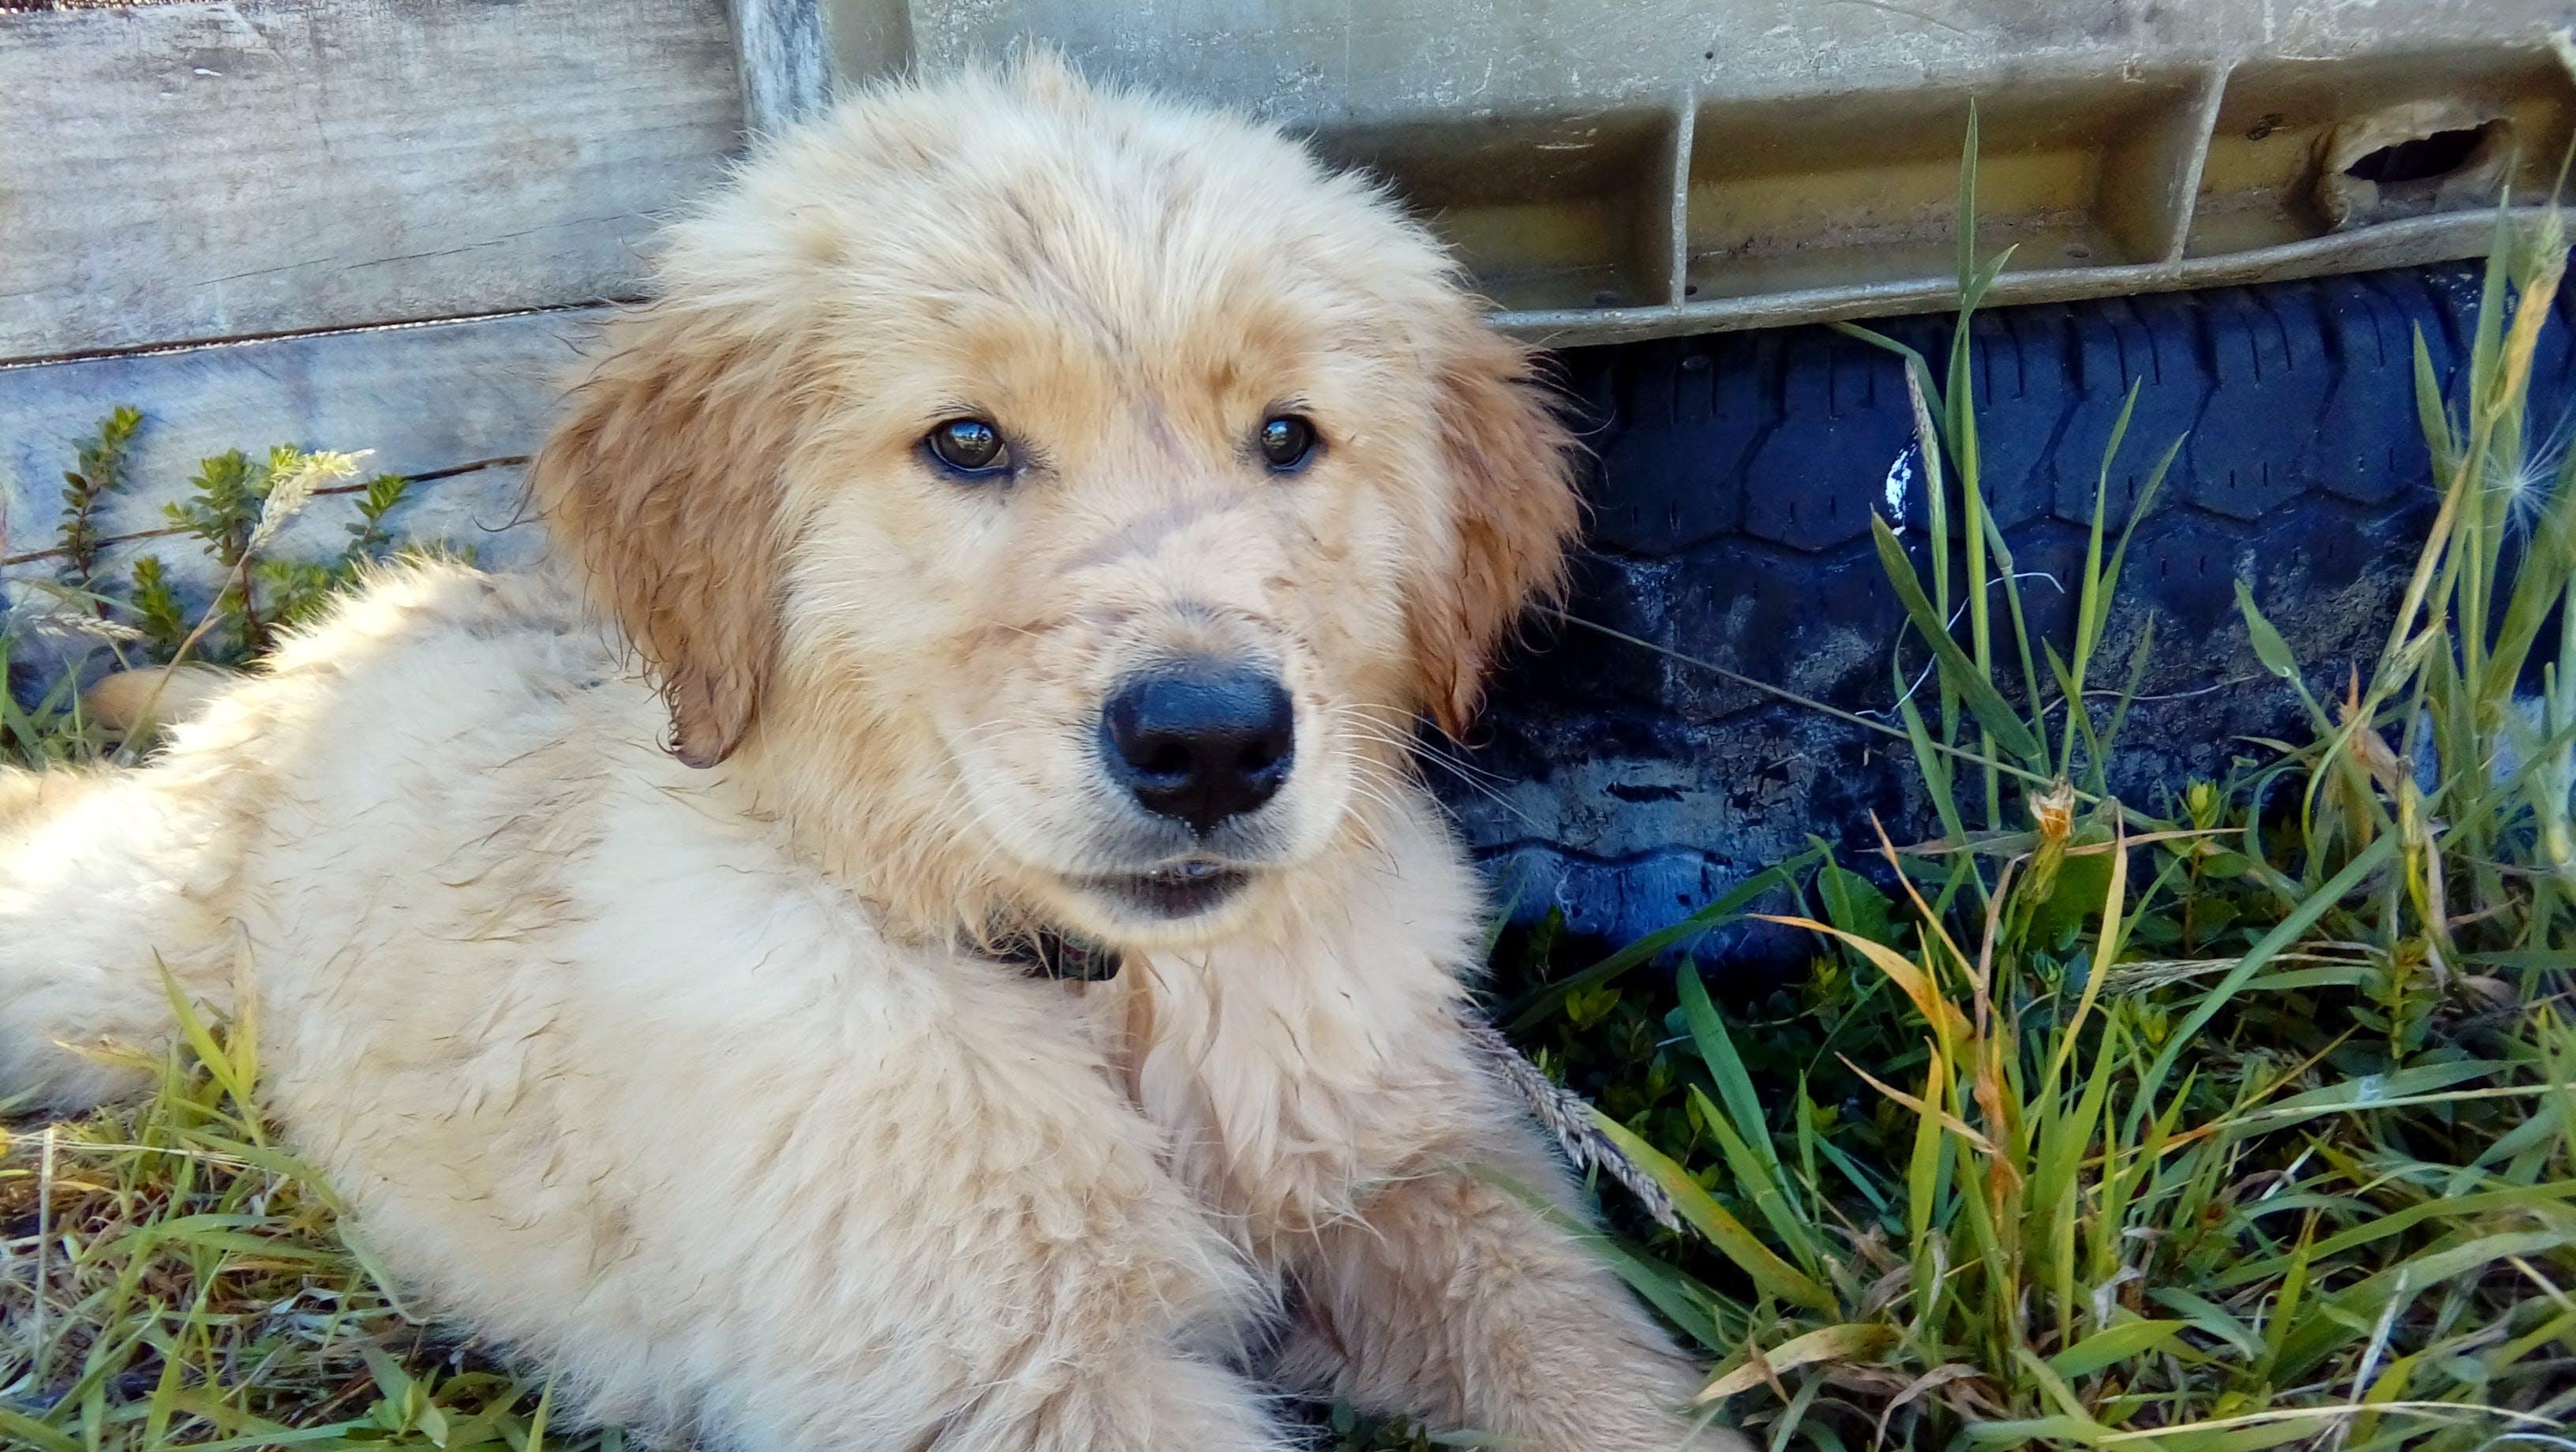 Free stock photo of baby dog, dog, golden retriever, grass